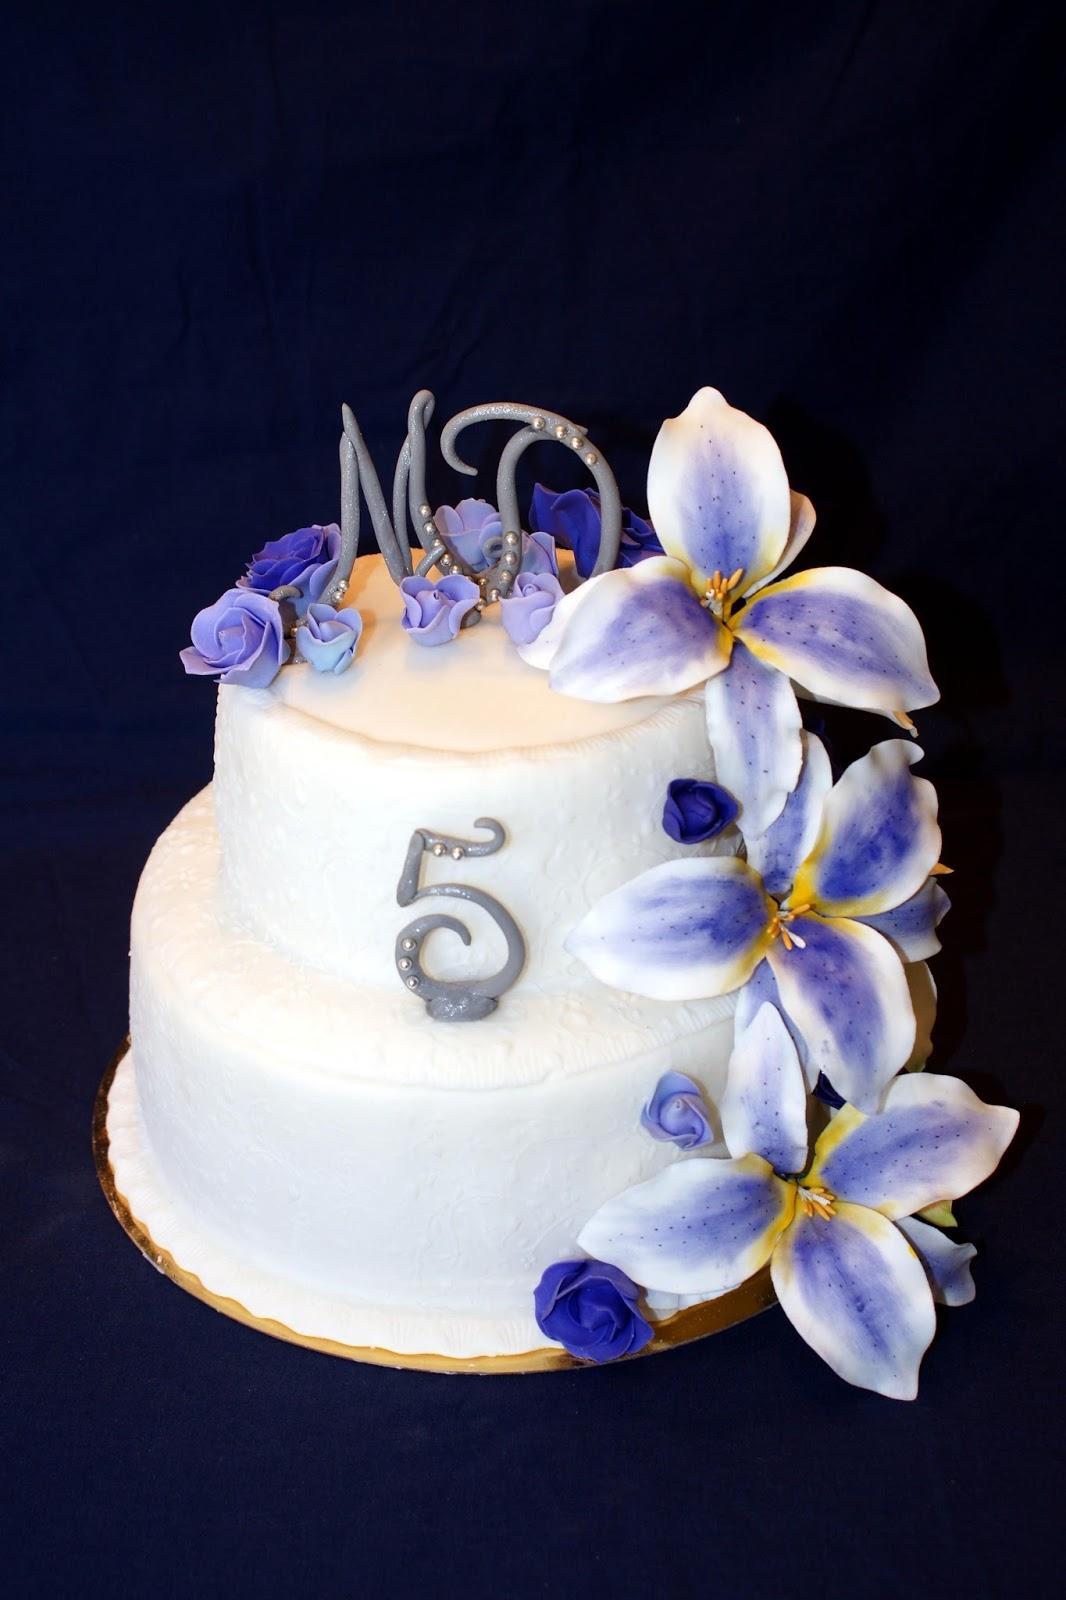 fem års bröllopsdag Marias Baksida: 2013 fem års bröllopsdag